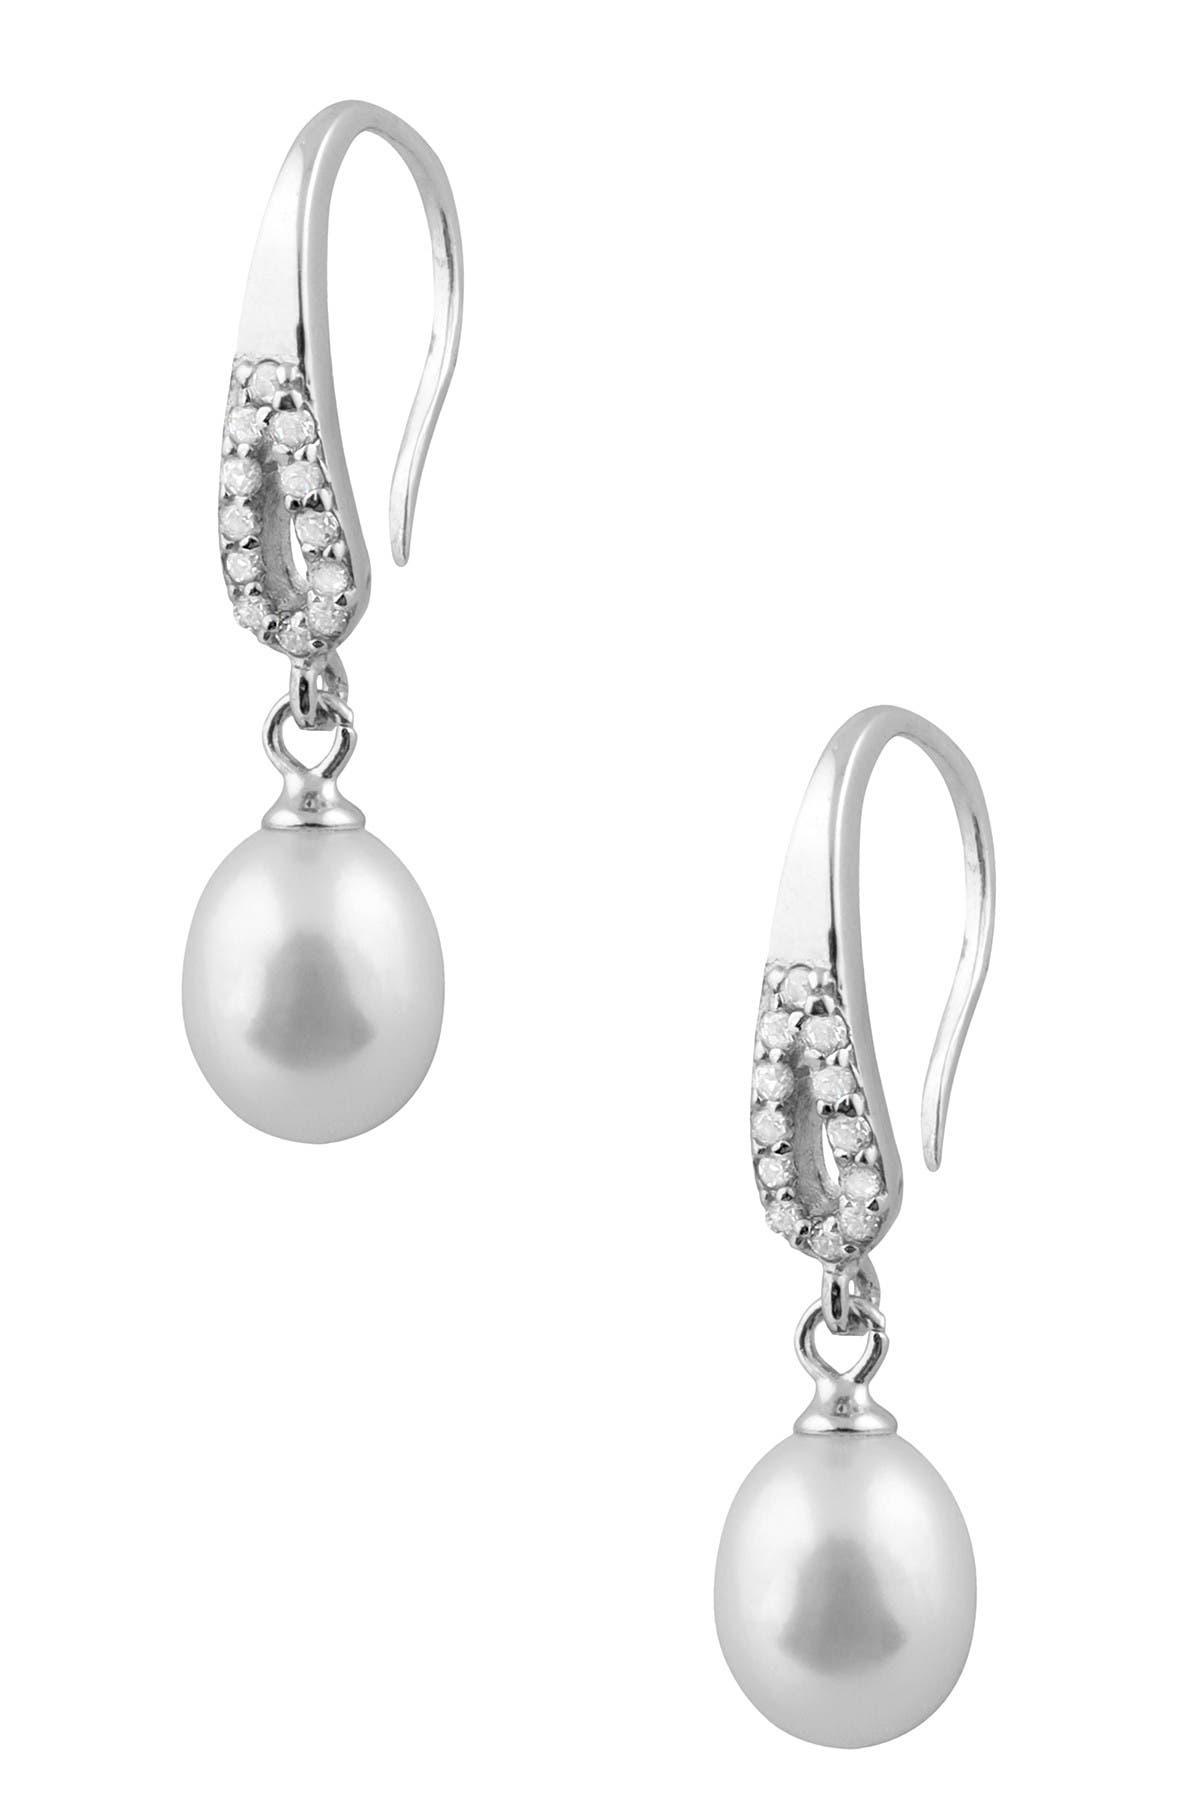 Image of Splendid Pearls 7.5-8mm Freshwater Pearl & CZ Drop Earrings